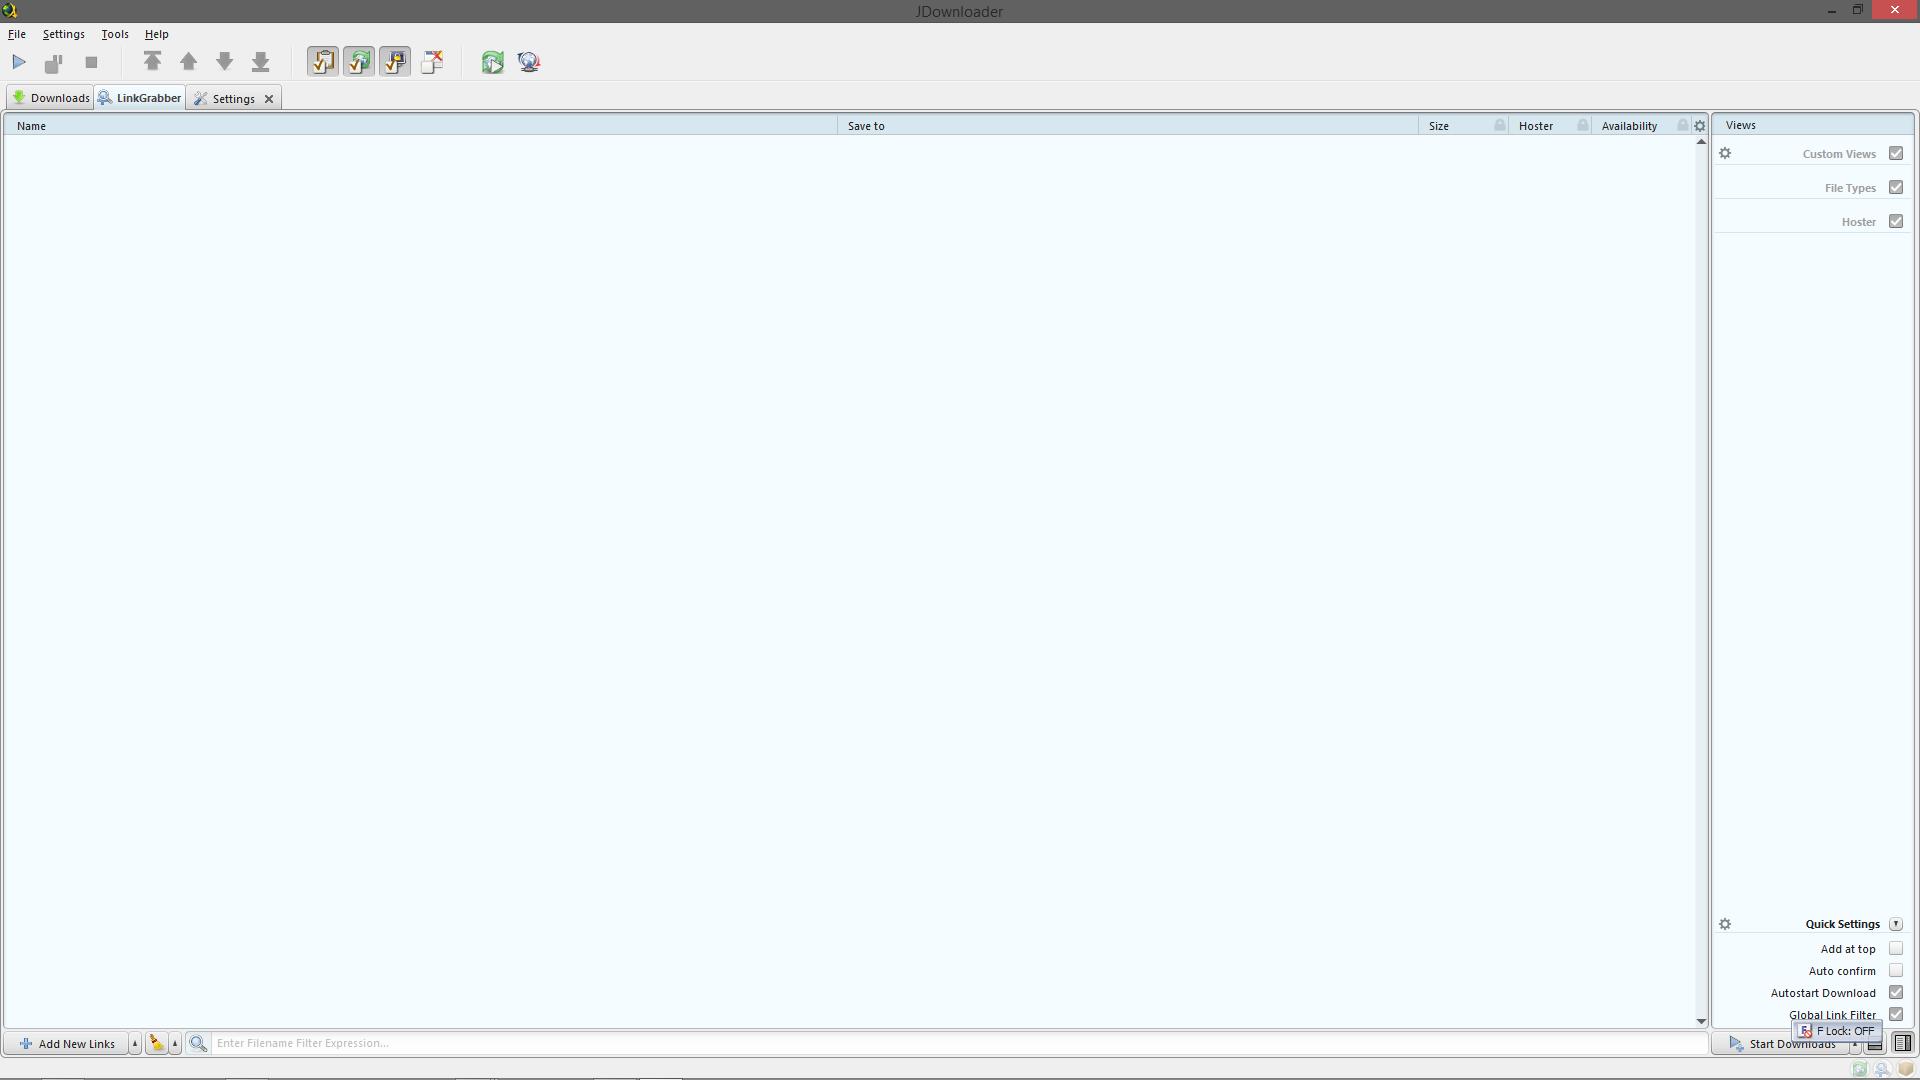 Microsoft security essential xp 32 bit free download - Download Microsoft Security Essentials 32 Bit Offline